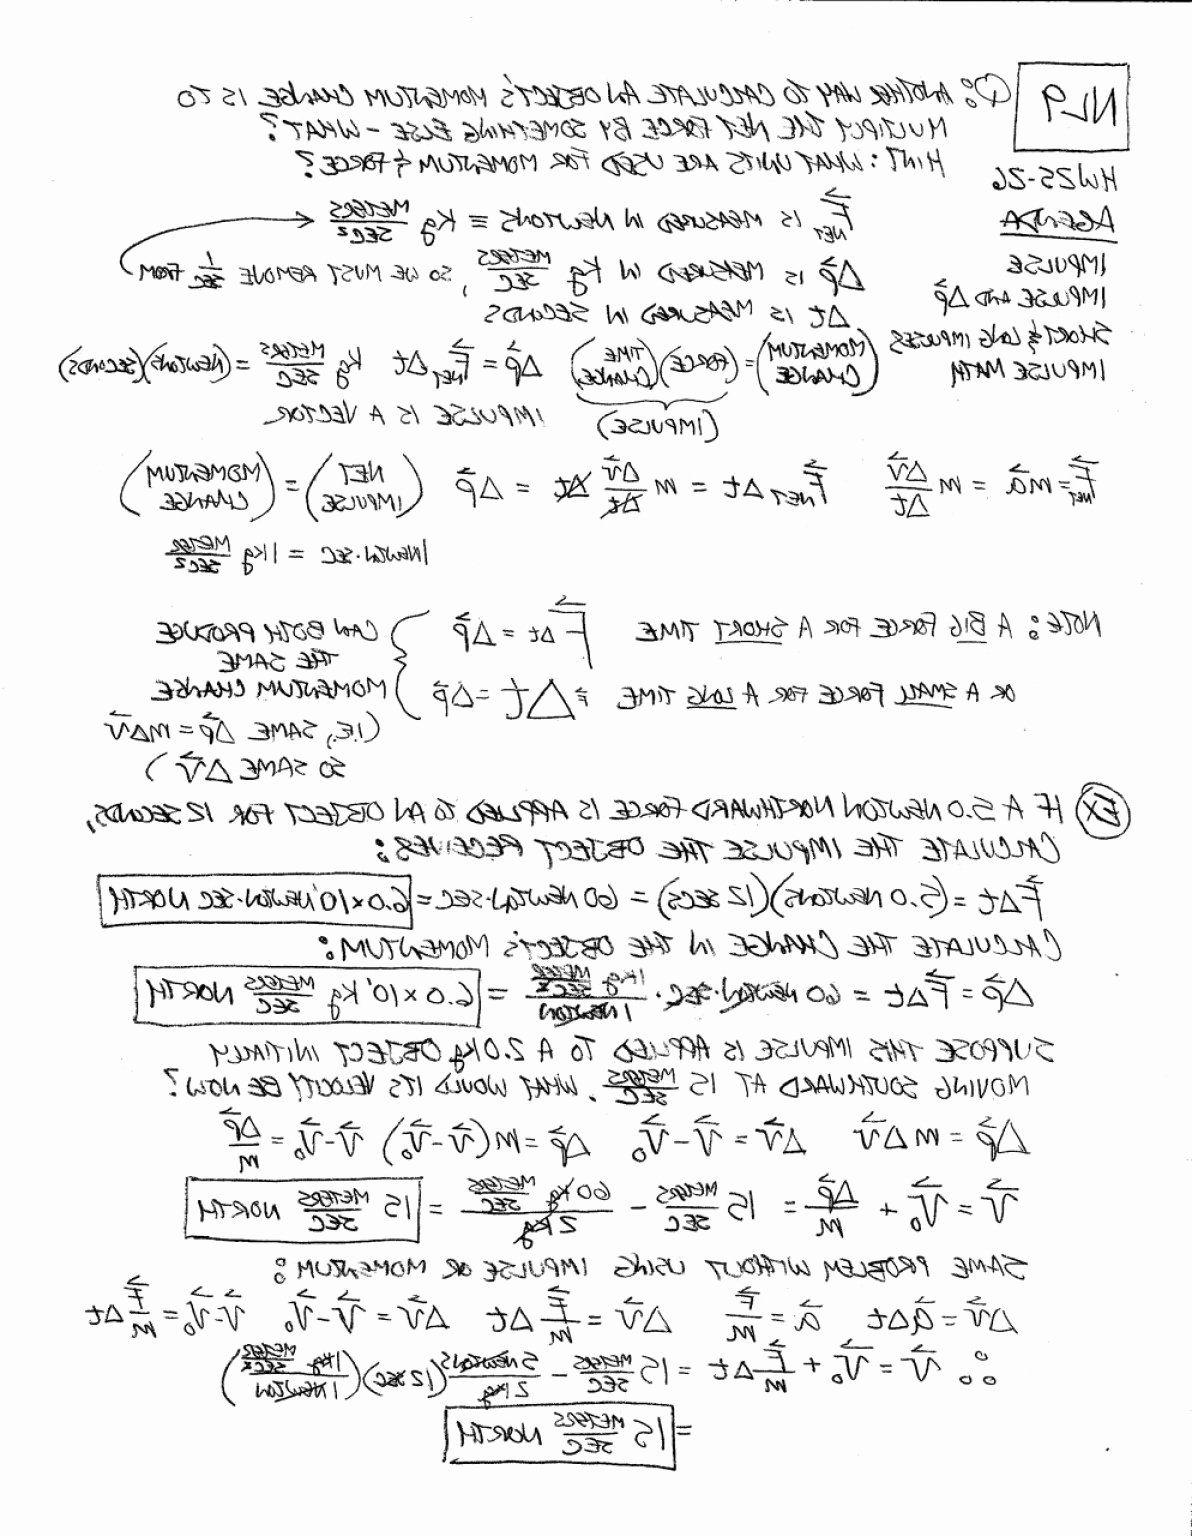 37 Simple Balancing Equations Worksheet Ideas